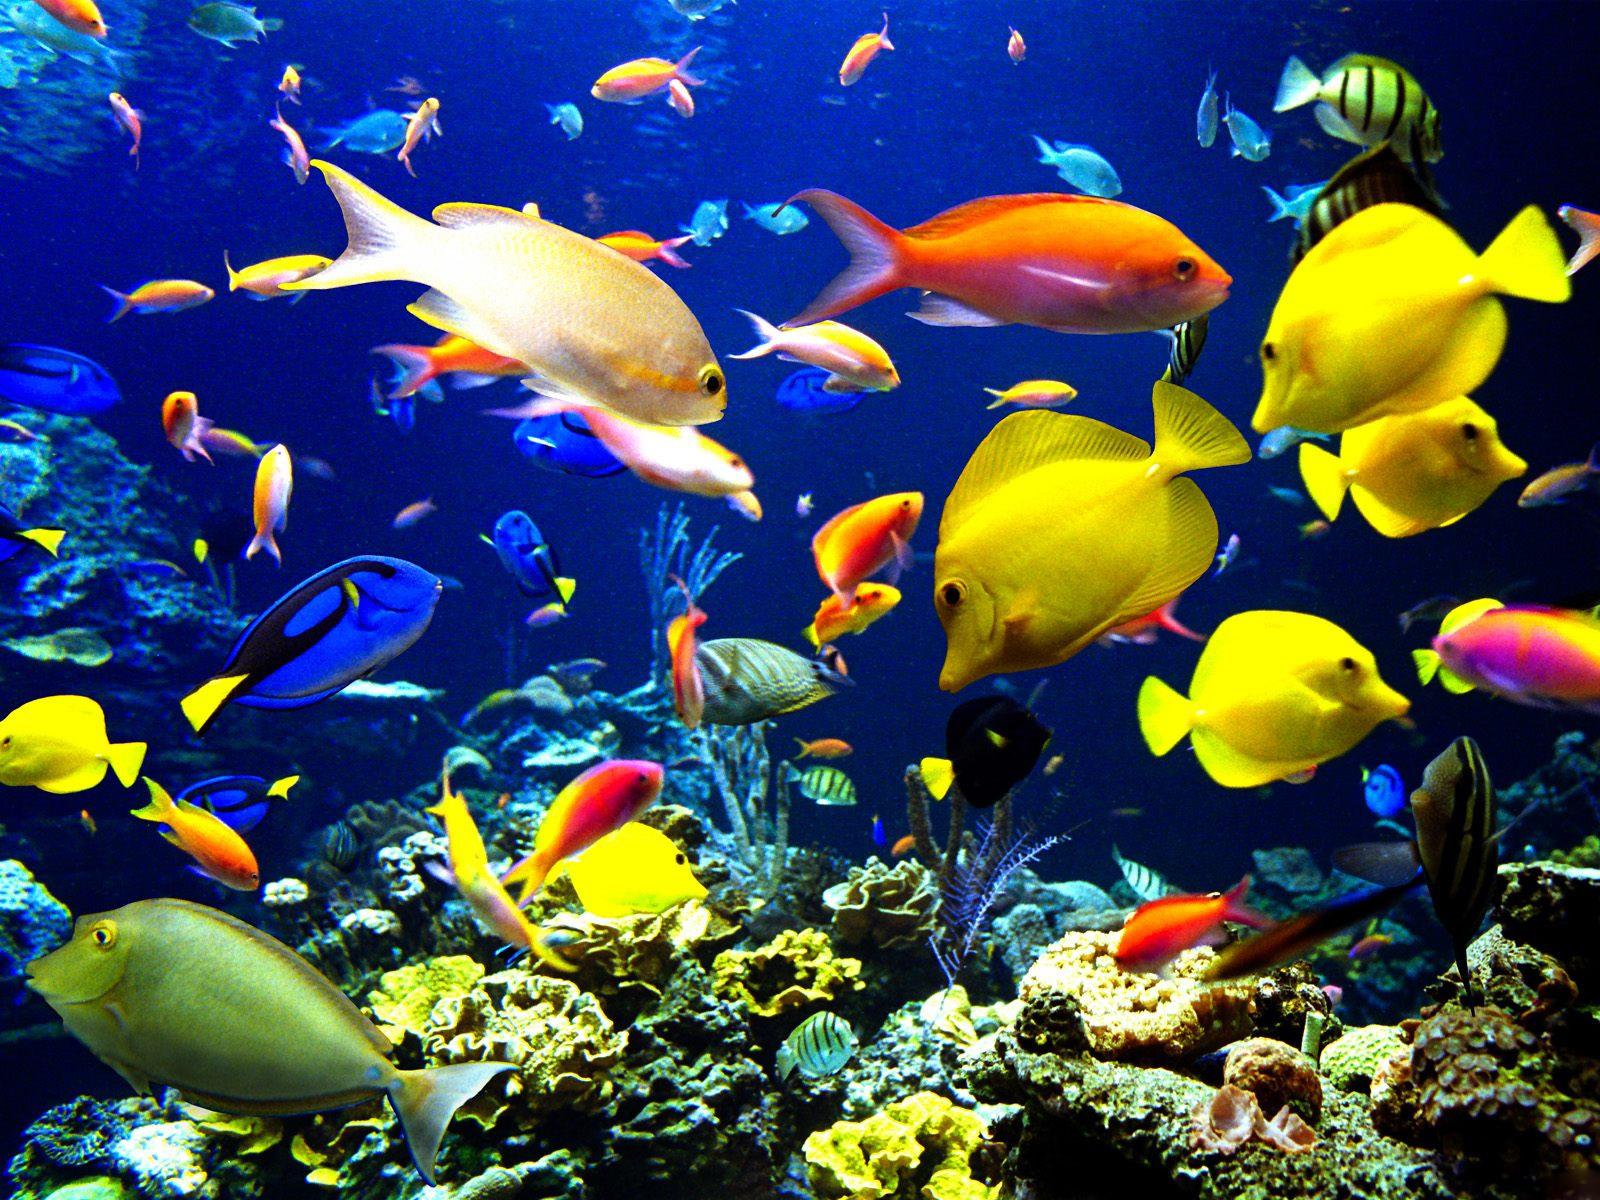 http://4.bp.blogspot.com/-QfTjVmHKF_M/TdrL9RruF2I/AAAAAAAAALU/hE-X8CIt-Yk/s1600/3d-underwater-wallpapers.jpg